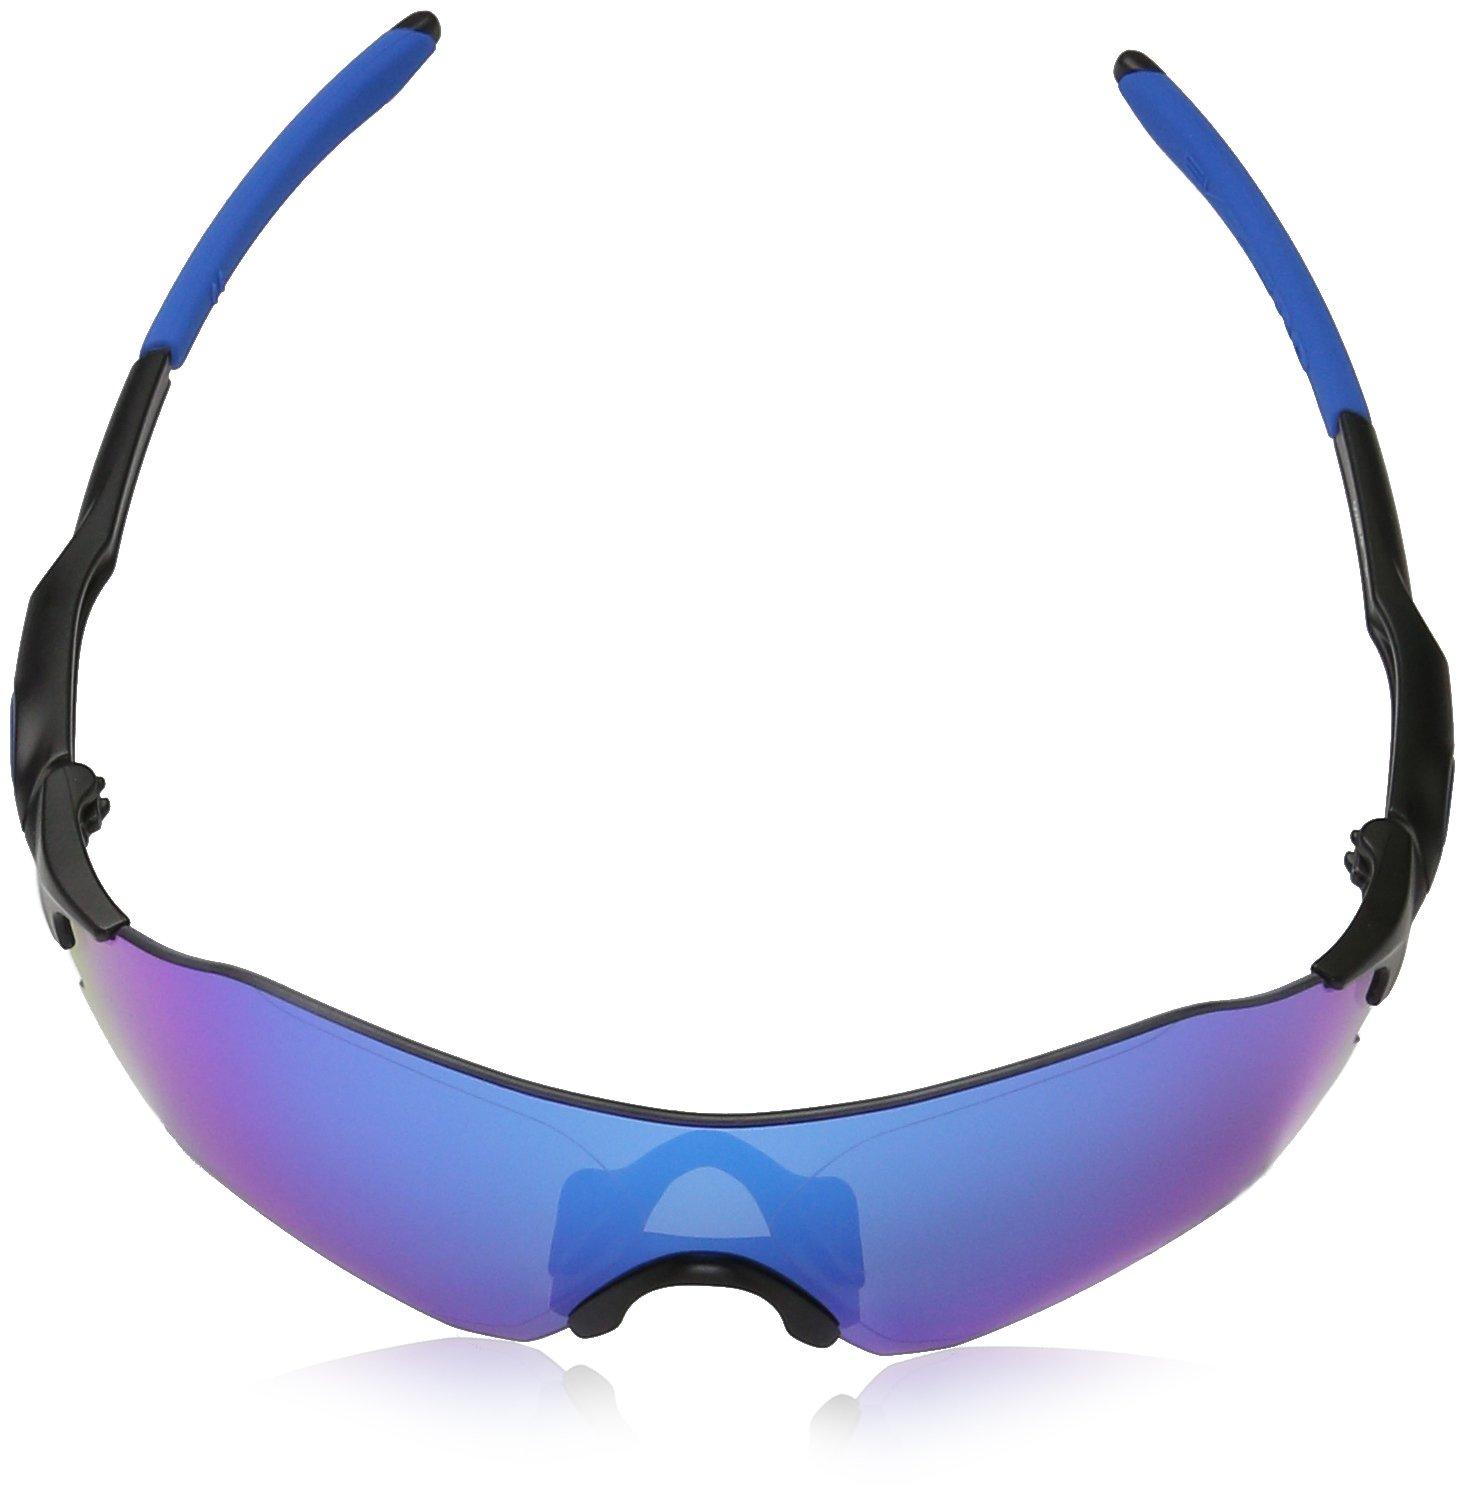 034243bbe7af Oakley Men's Evzero Range Polarized Iridium Rectangular Sunglasses, Matte  Black, 38 mm